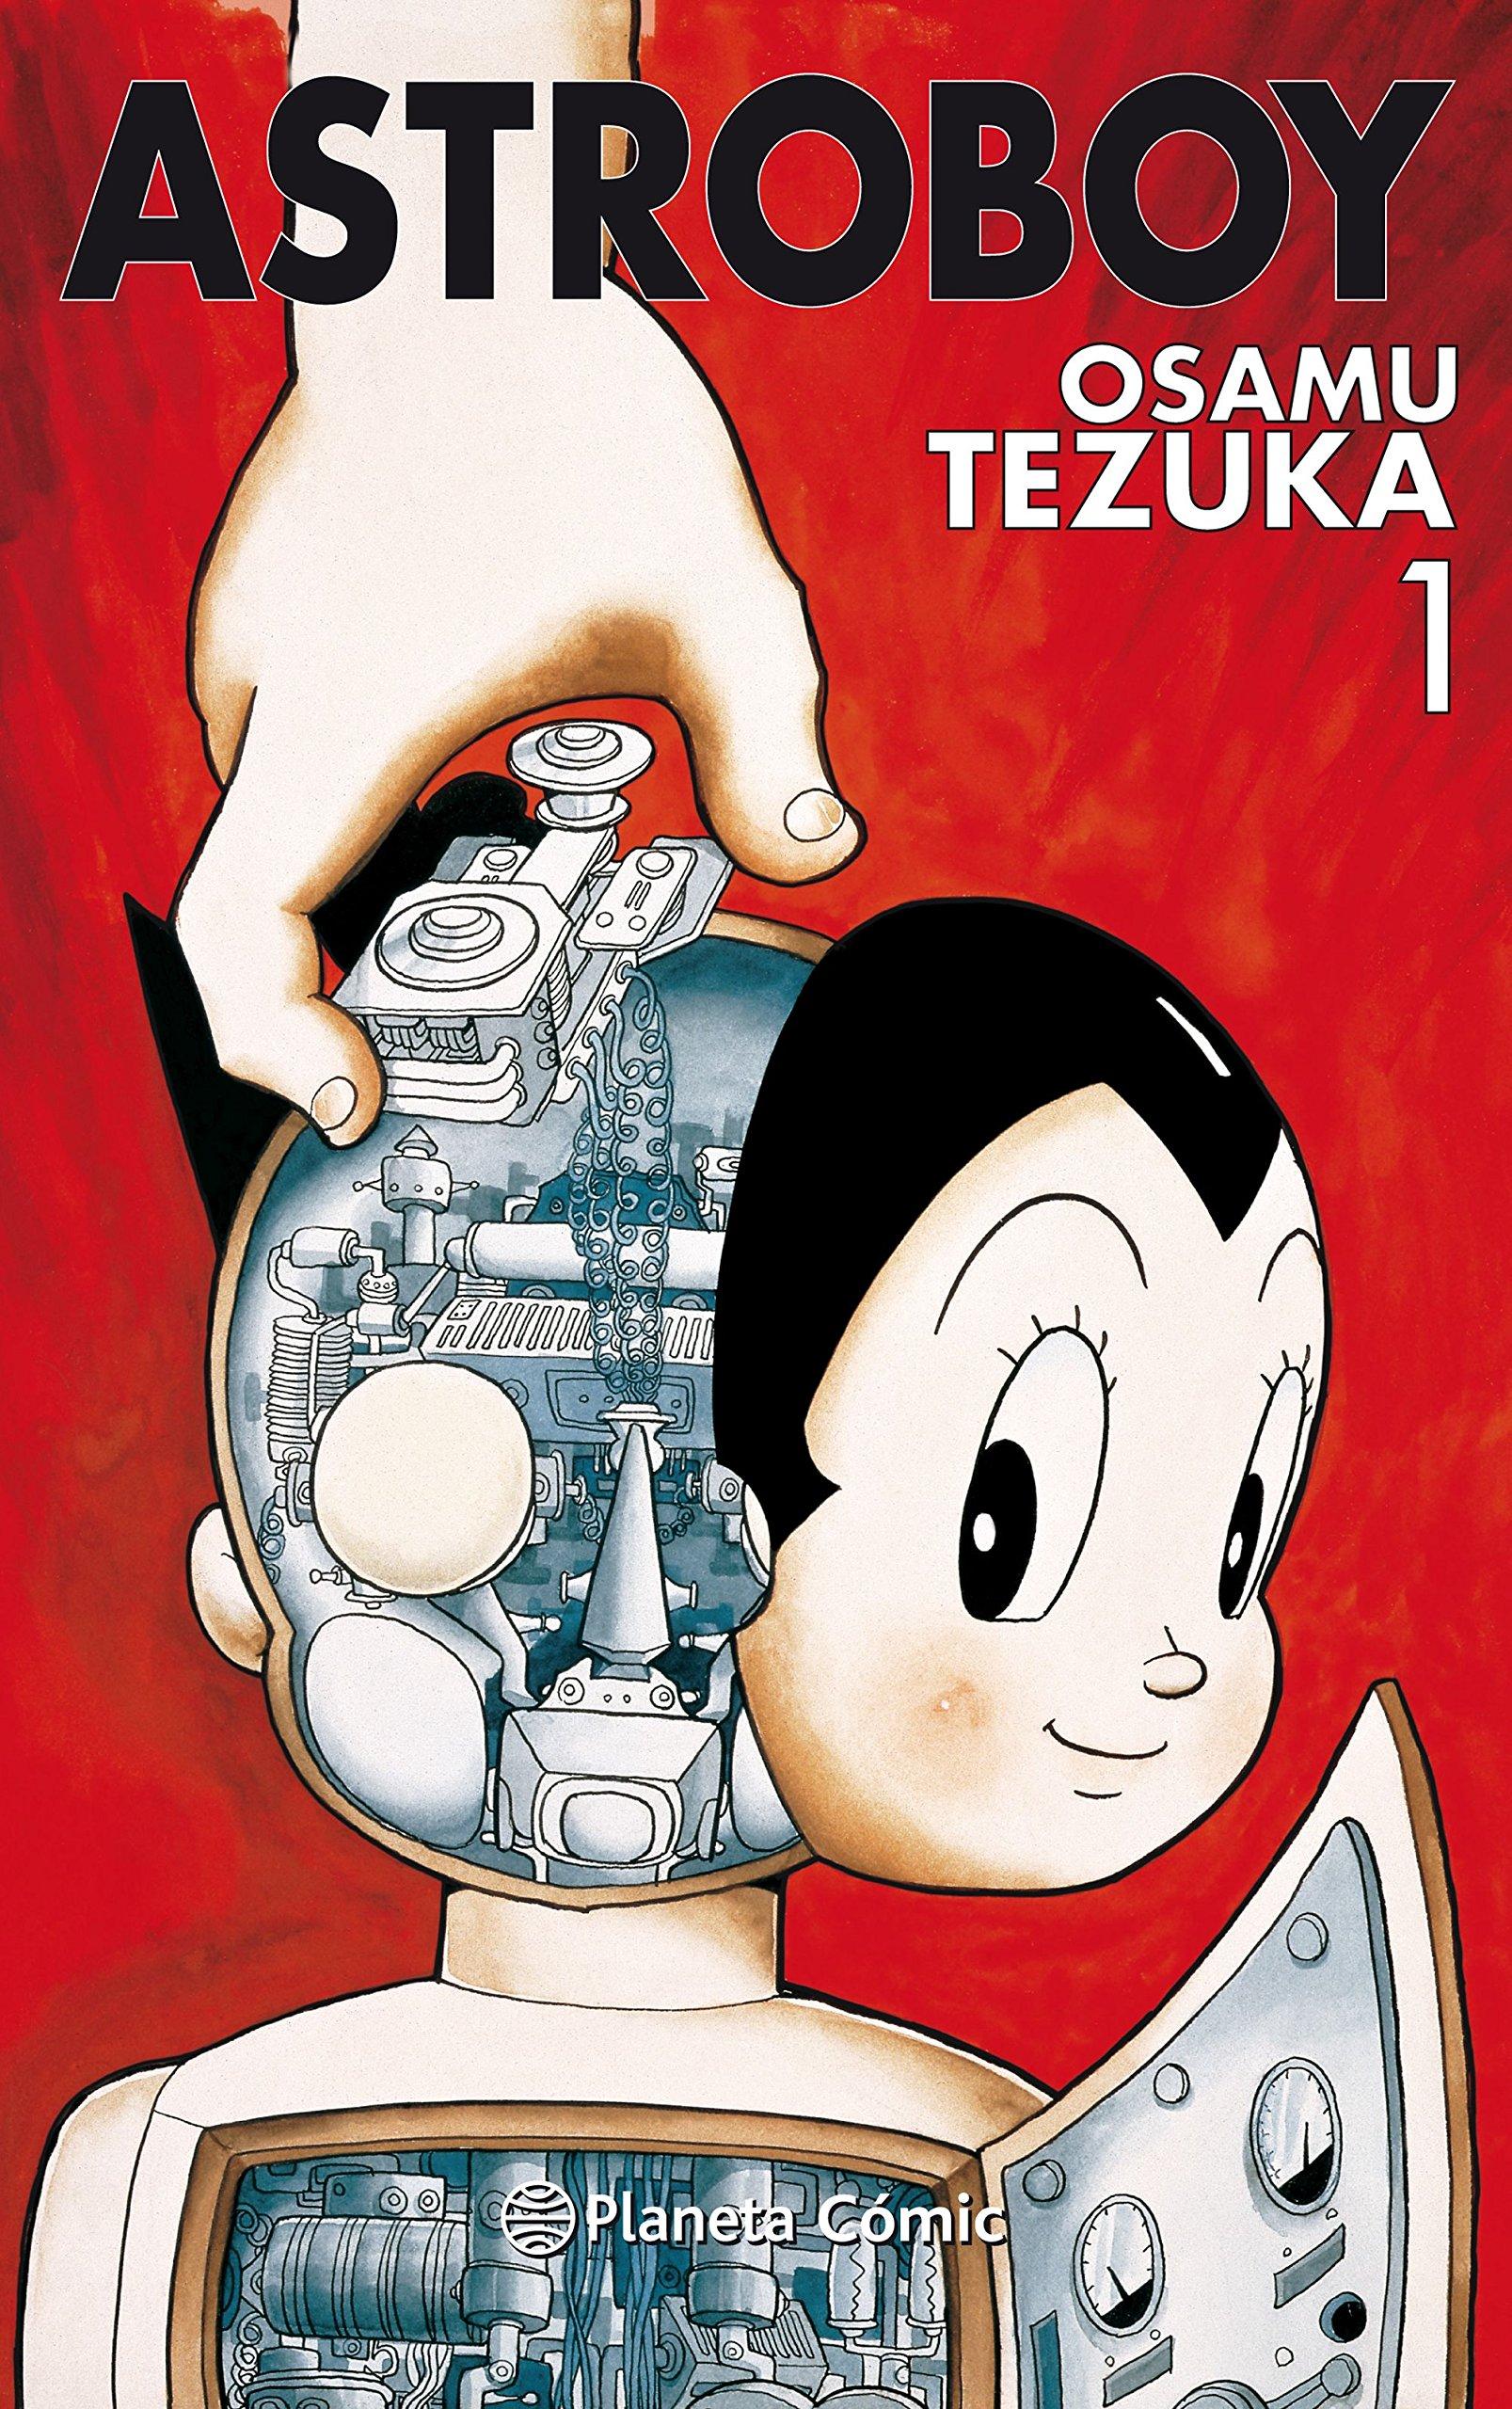 Astro Boy nº 01/07 (Manga: Biblioteca Tezuka): Amazon.es: Tezuka, Osamu, Daruma: Libros